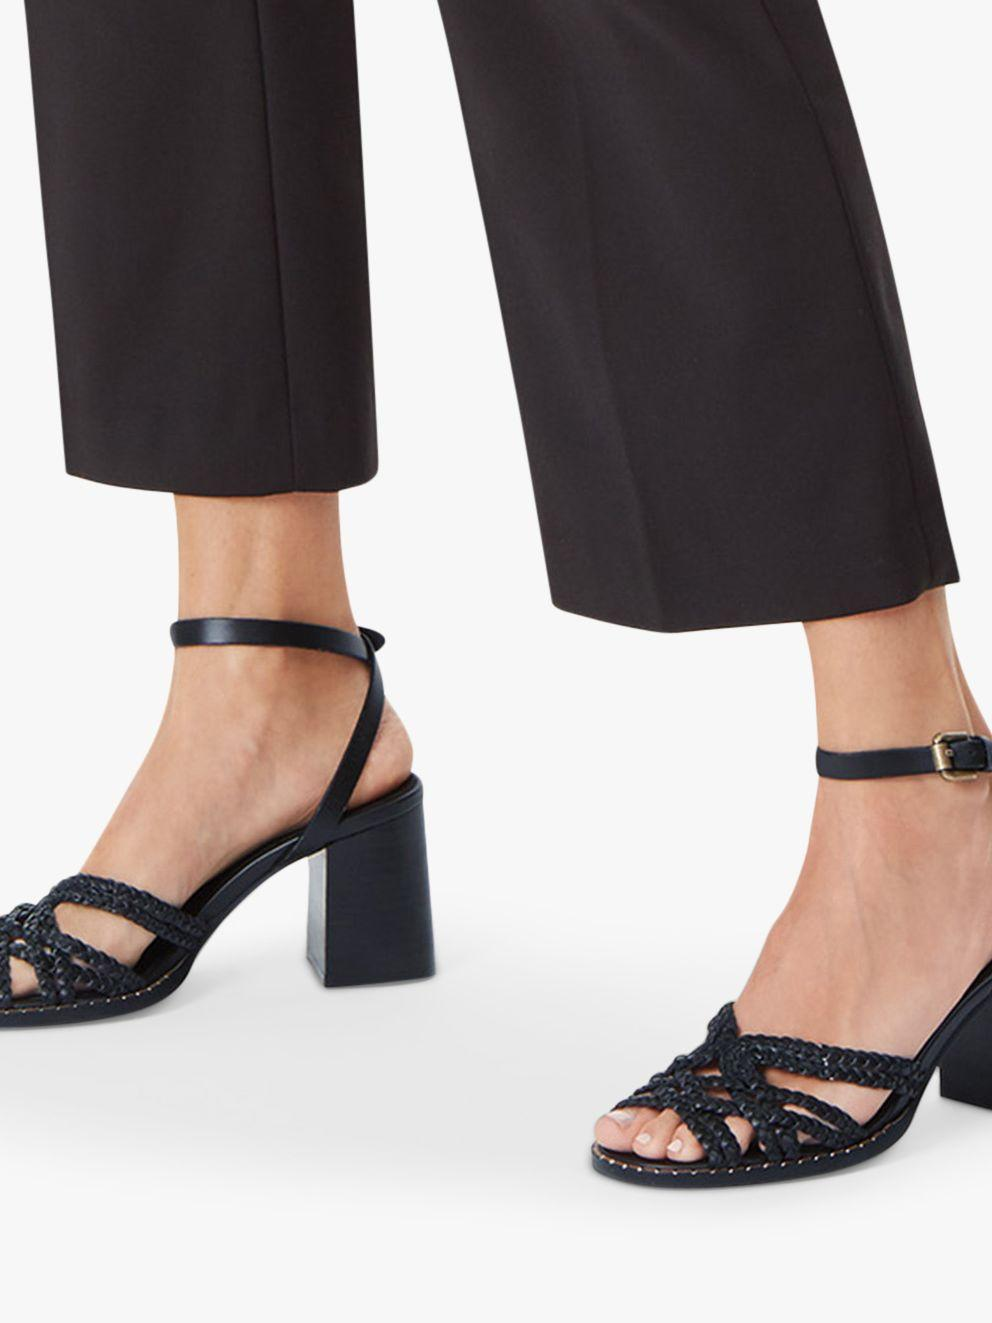 51ea2bda2fe See By Chloé Gladiator Braid Block Heel Sandals in Black - Lyst